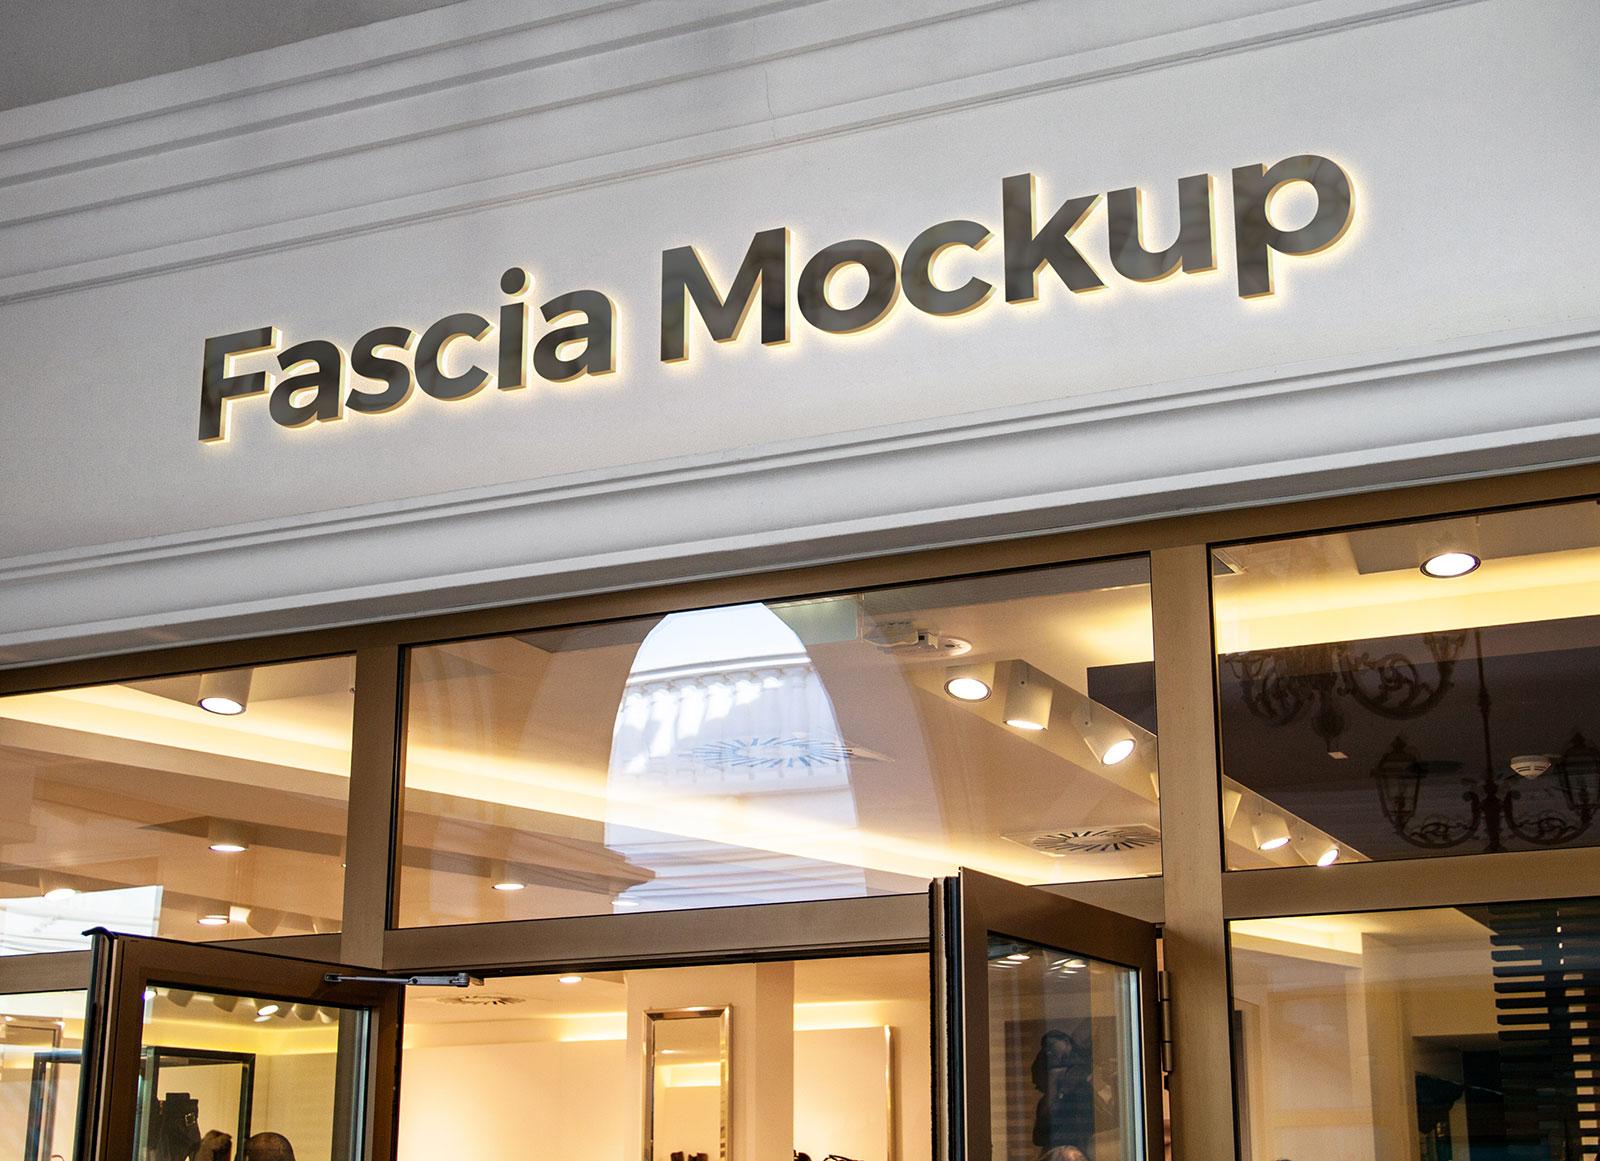 Free-Shop-Name-Fascia-Backlit-Logo-Mockup-PSD